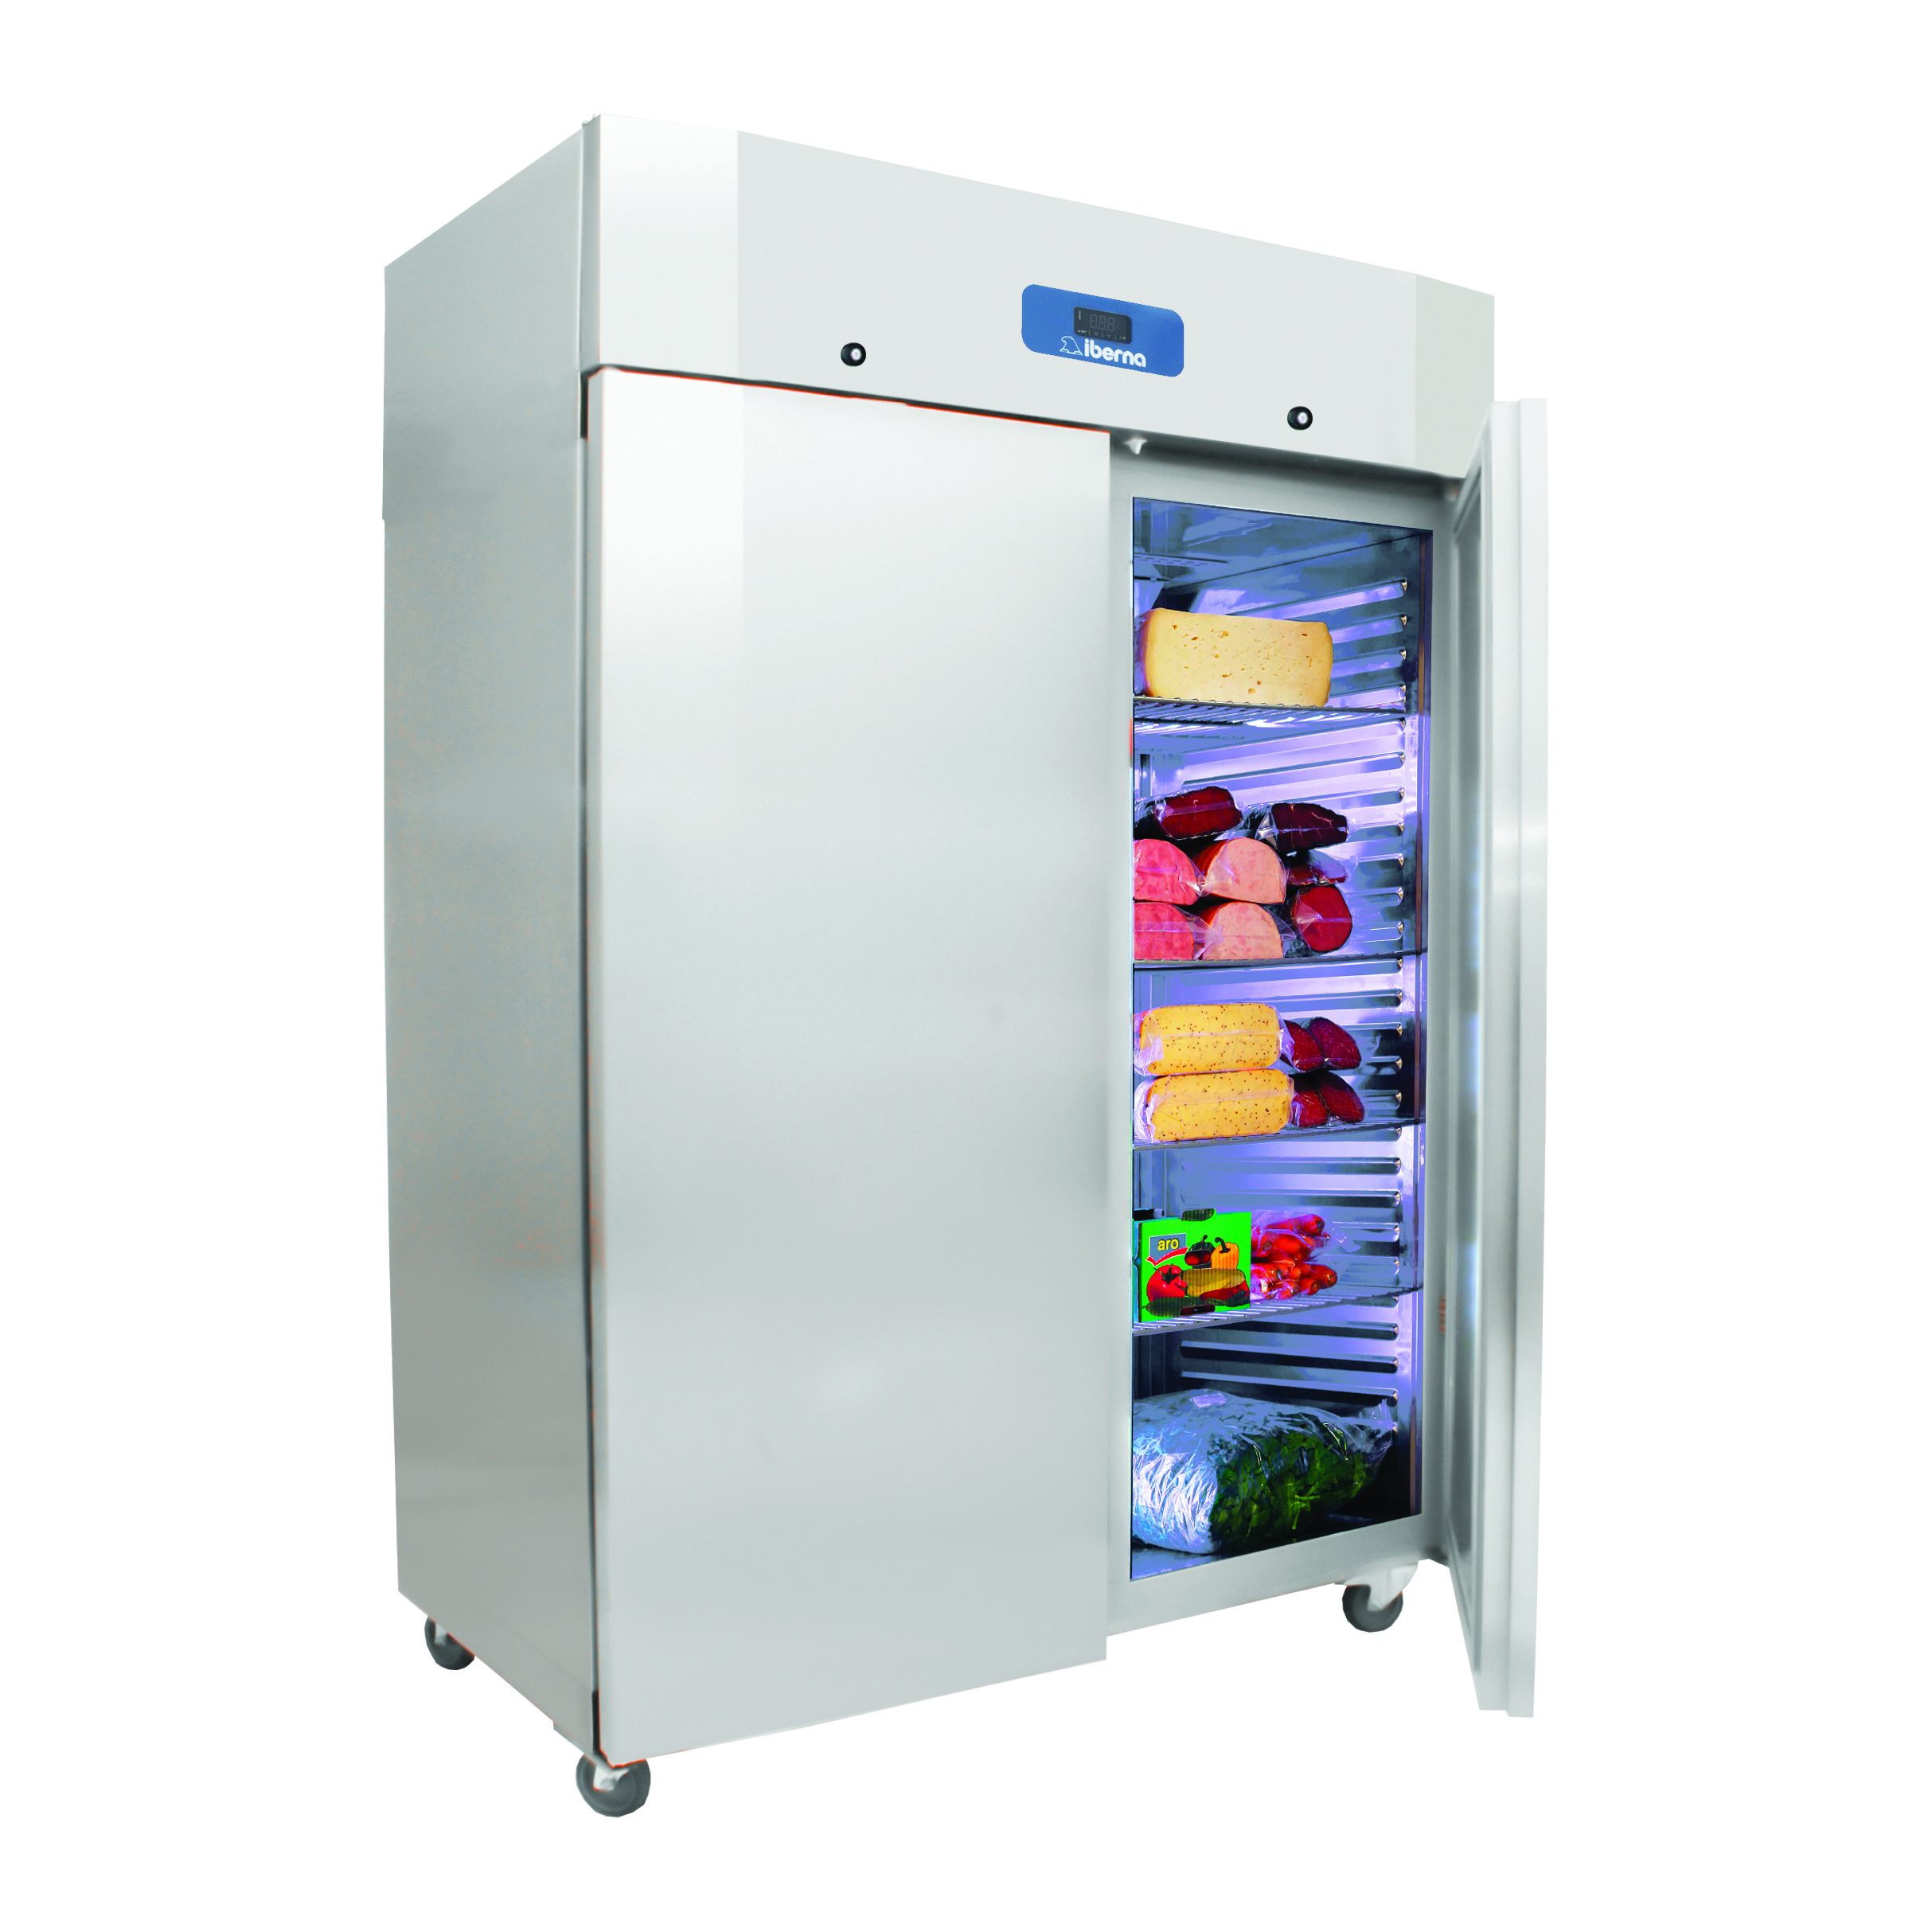 vente et depannage armoire refrigeree lea ecoenergy paris